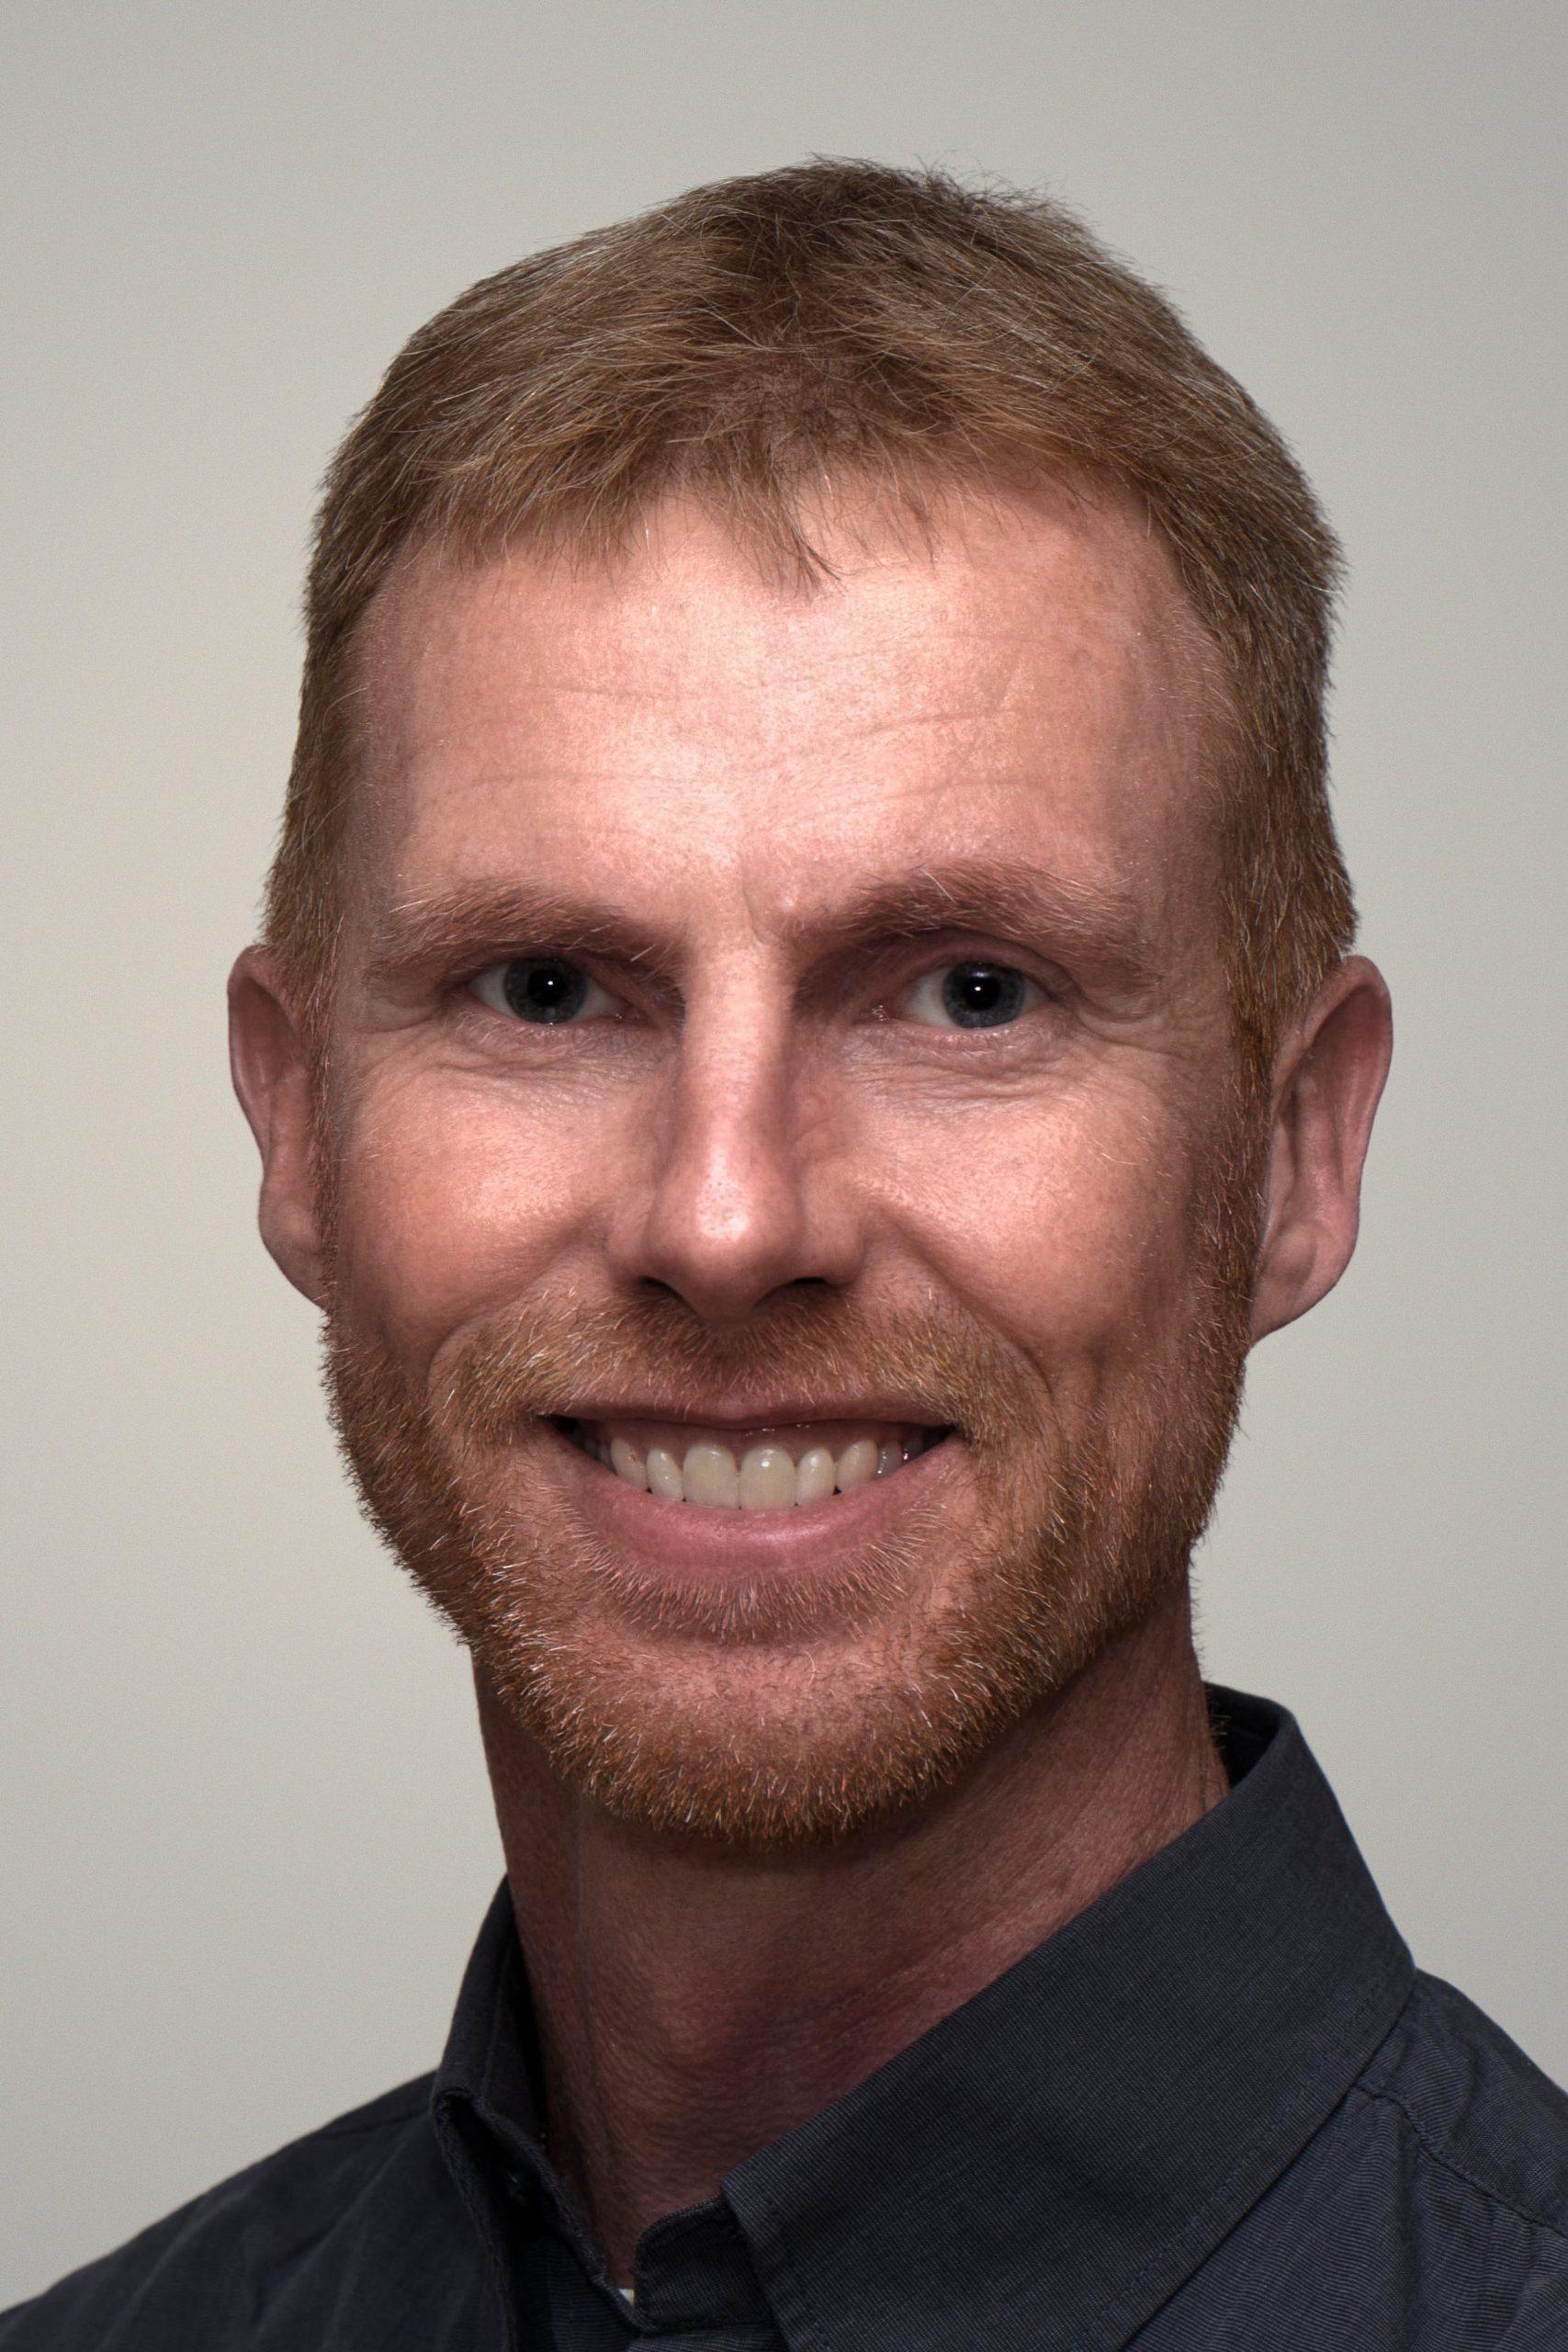 Andreas Backs (45)